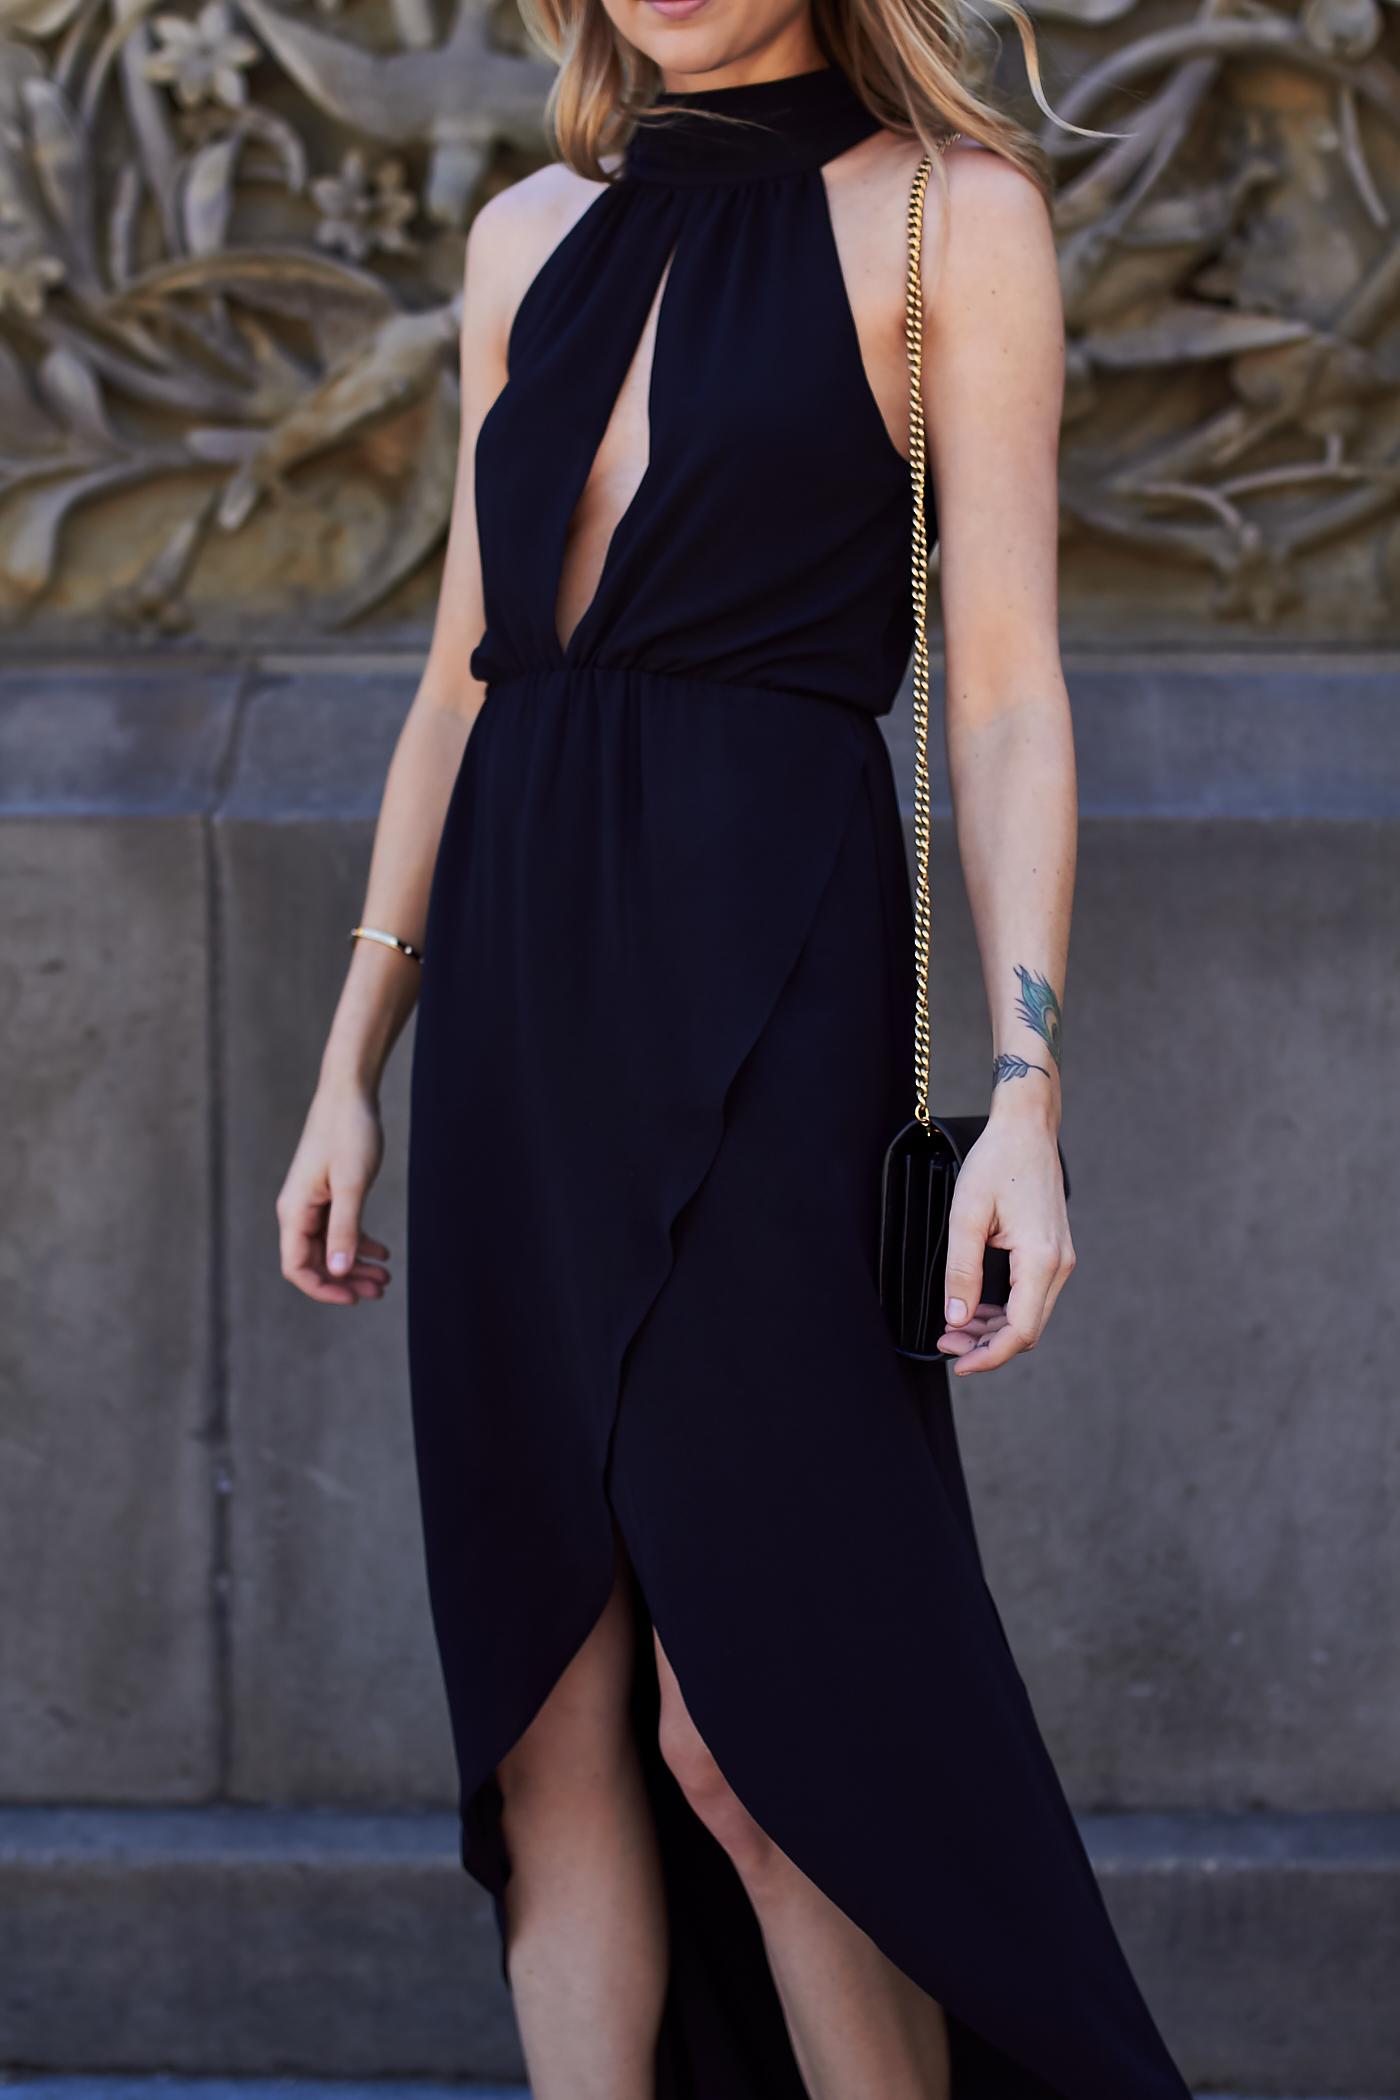 fashion-jackson-black-plunge-neck-high-low-hem-dress